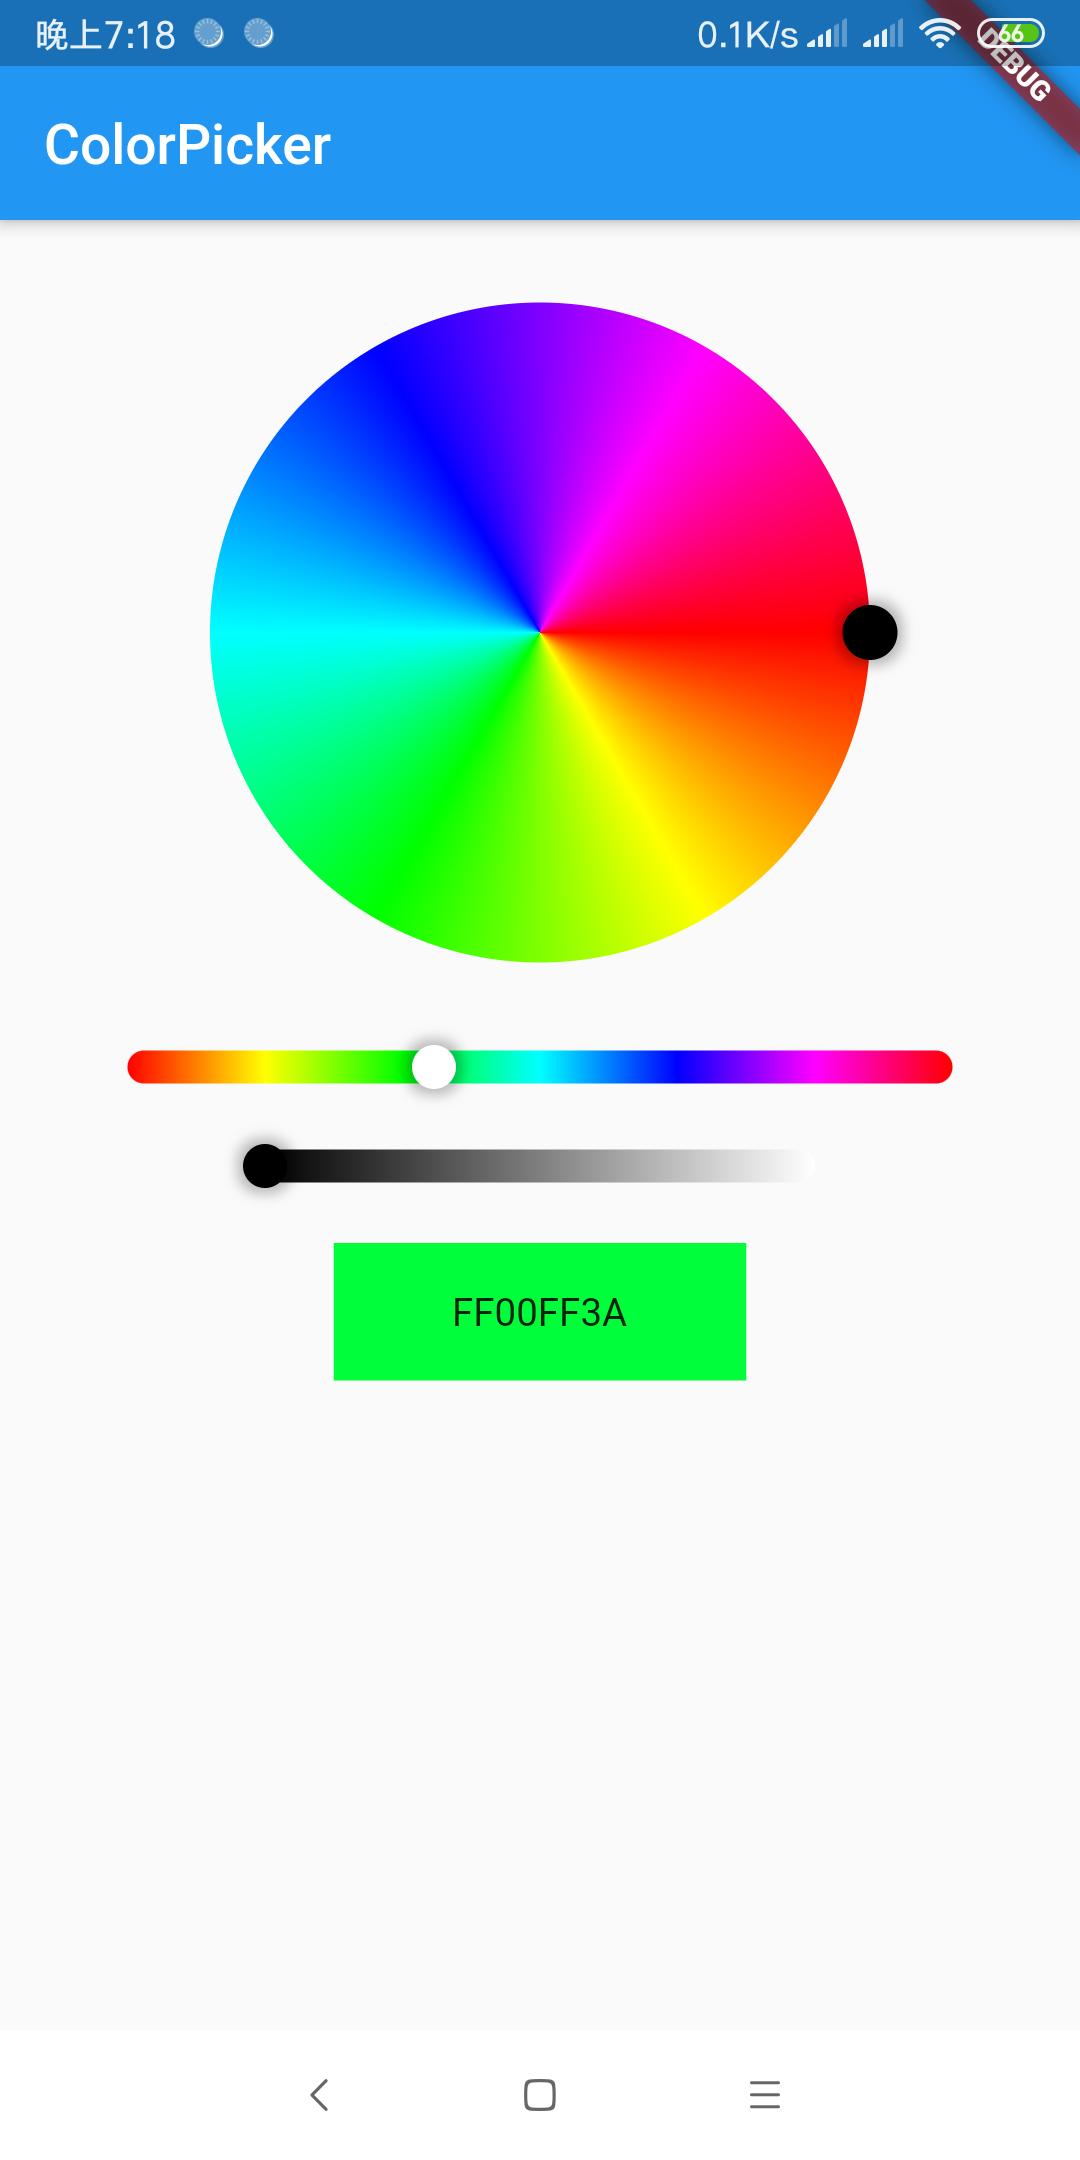 GitHub - Cricin/ColorPicker-flutter: A color picker for flutter